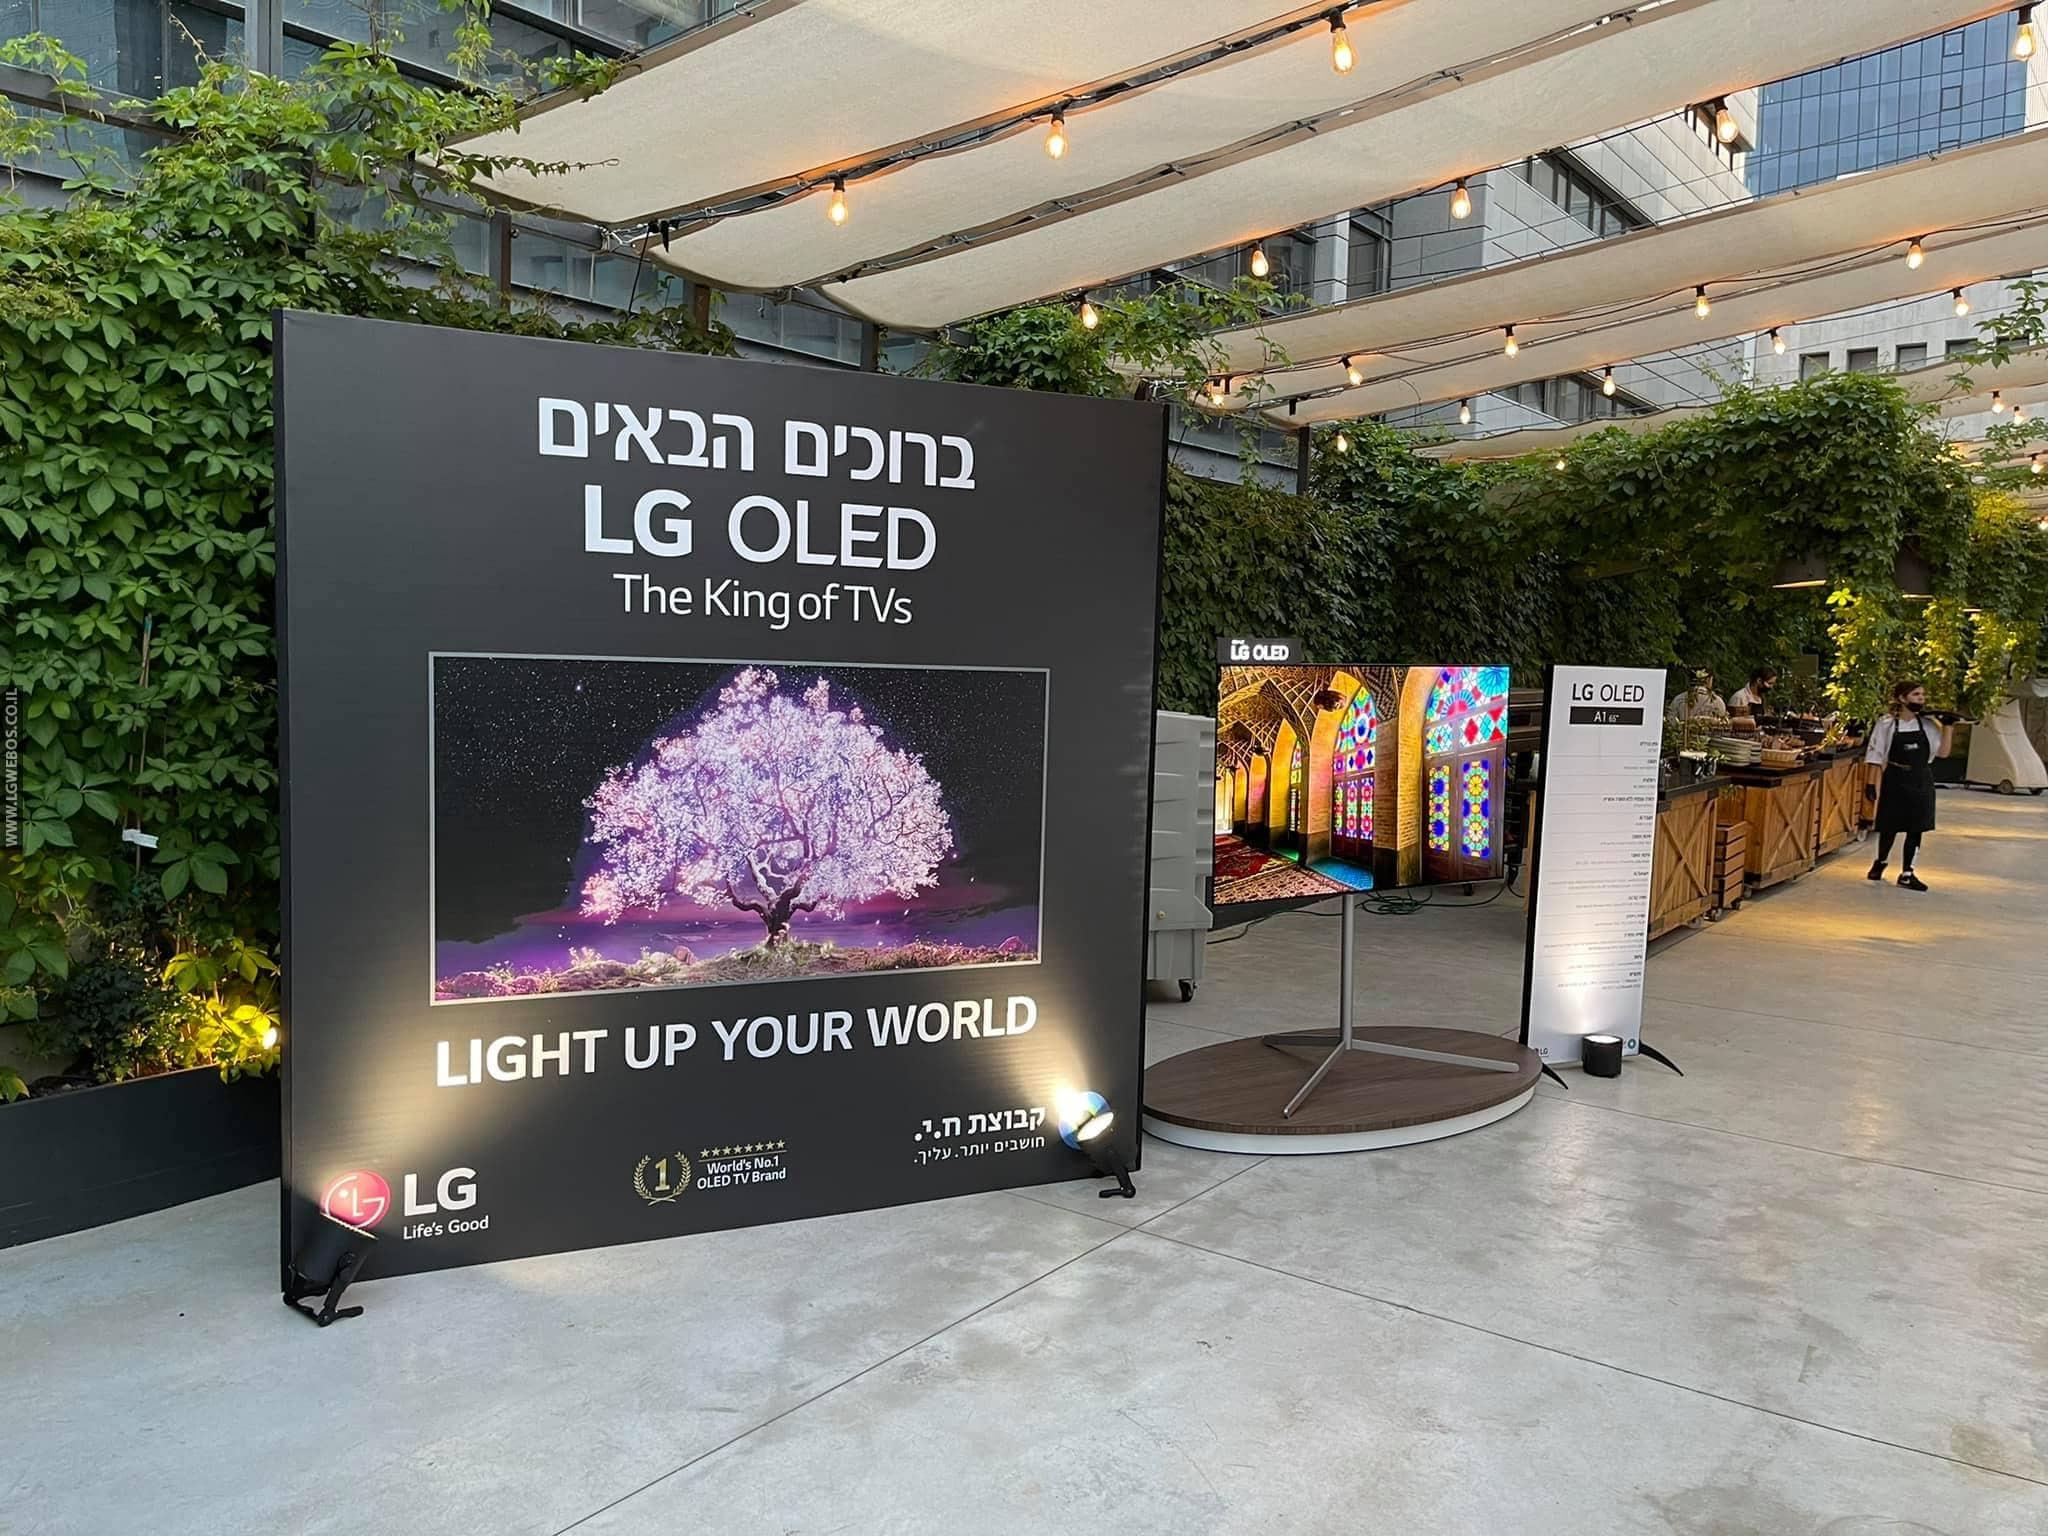 LG משיקה בישראל את סדרות הטלוויזיות החדשות לשנת 2021 (וידיאו)